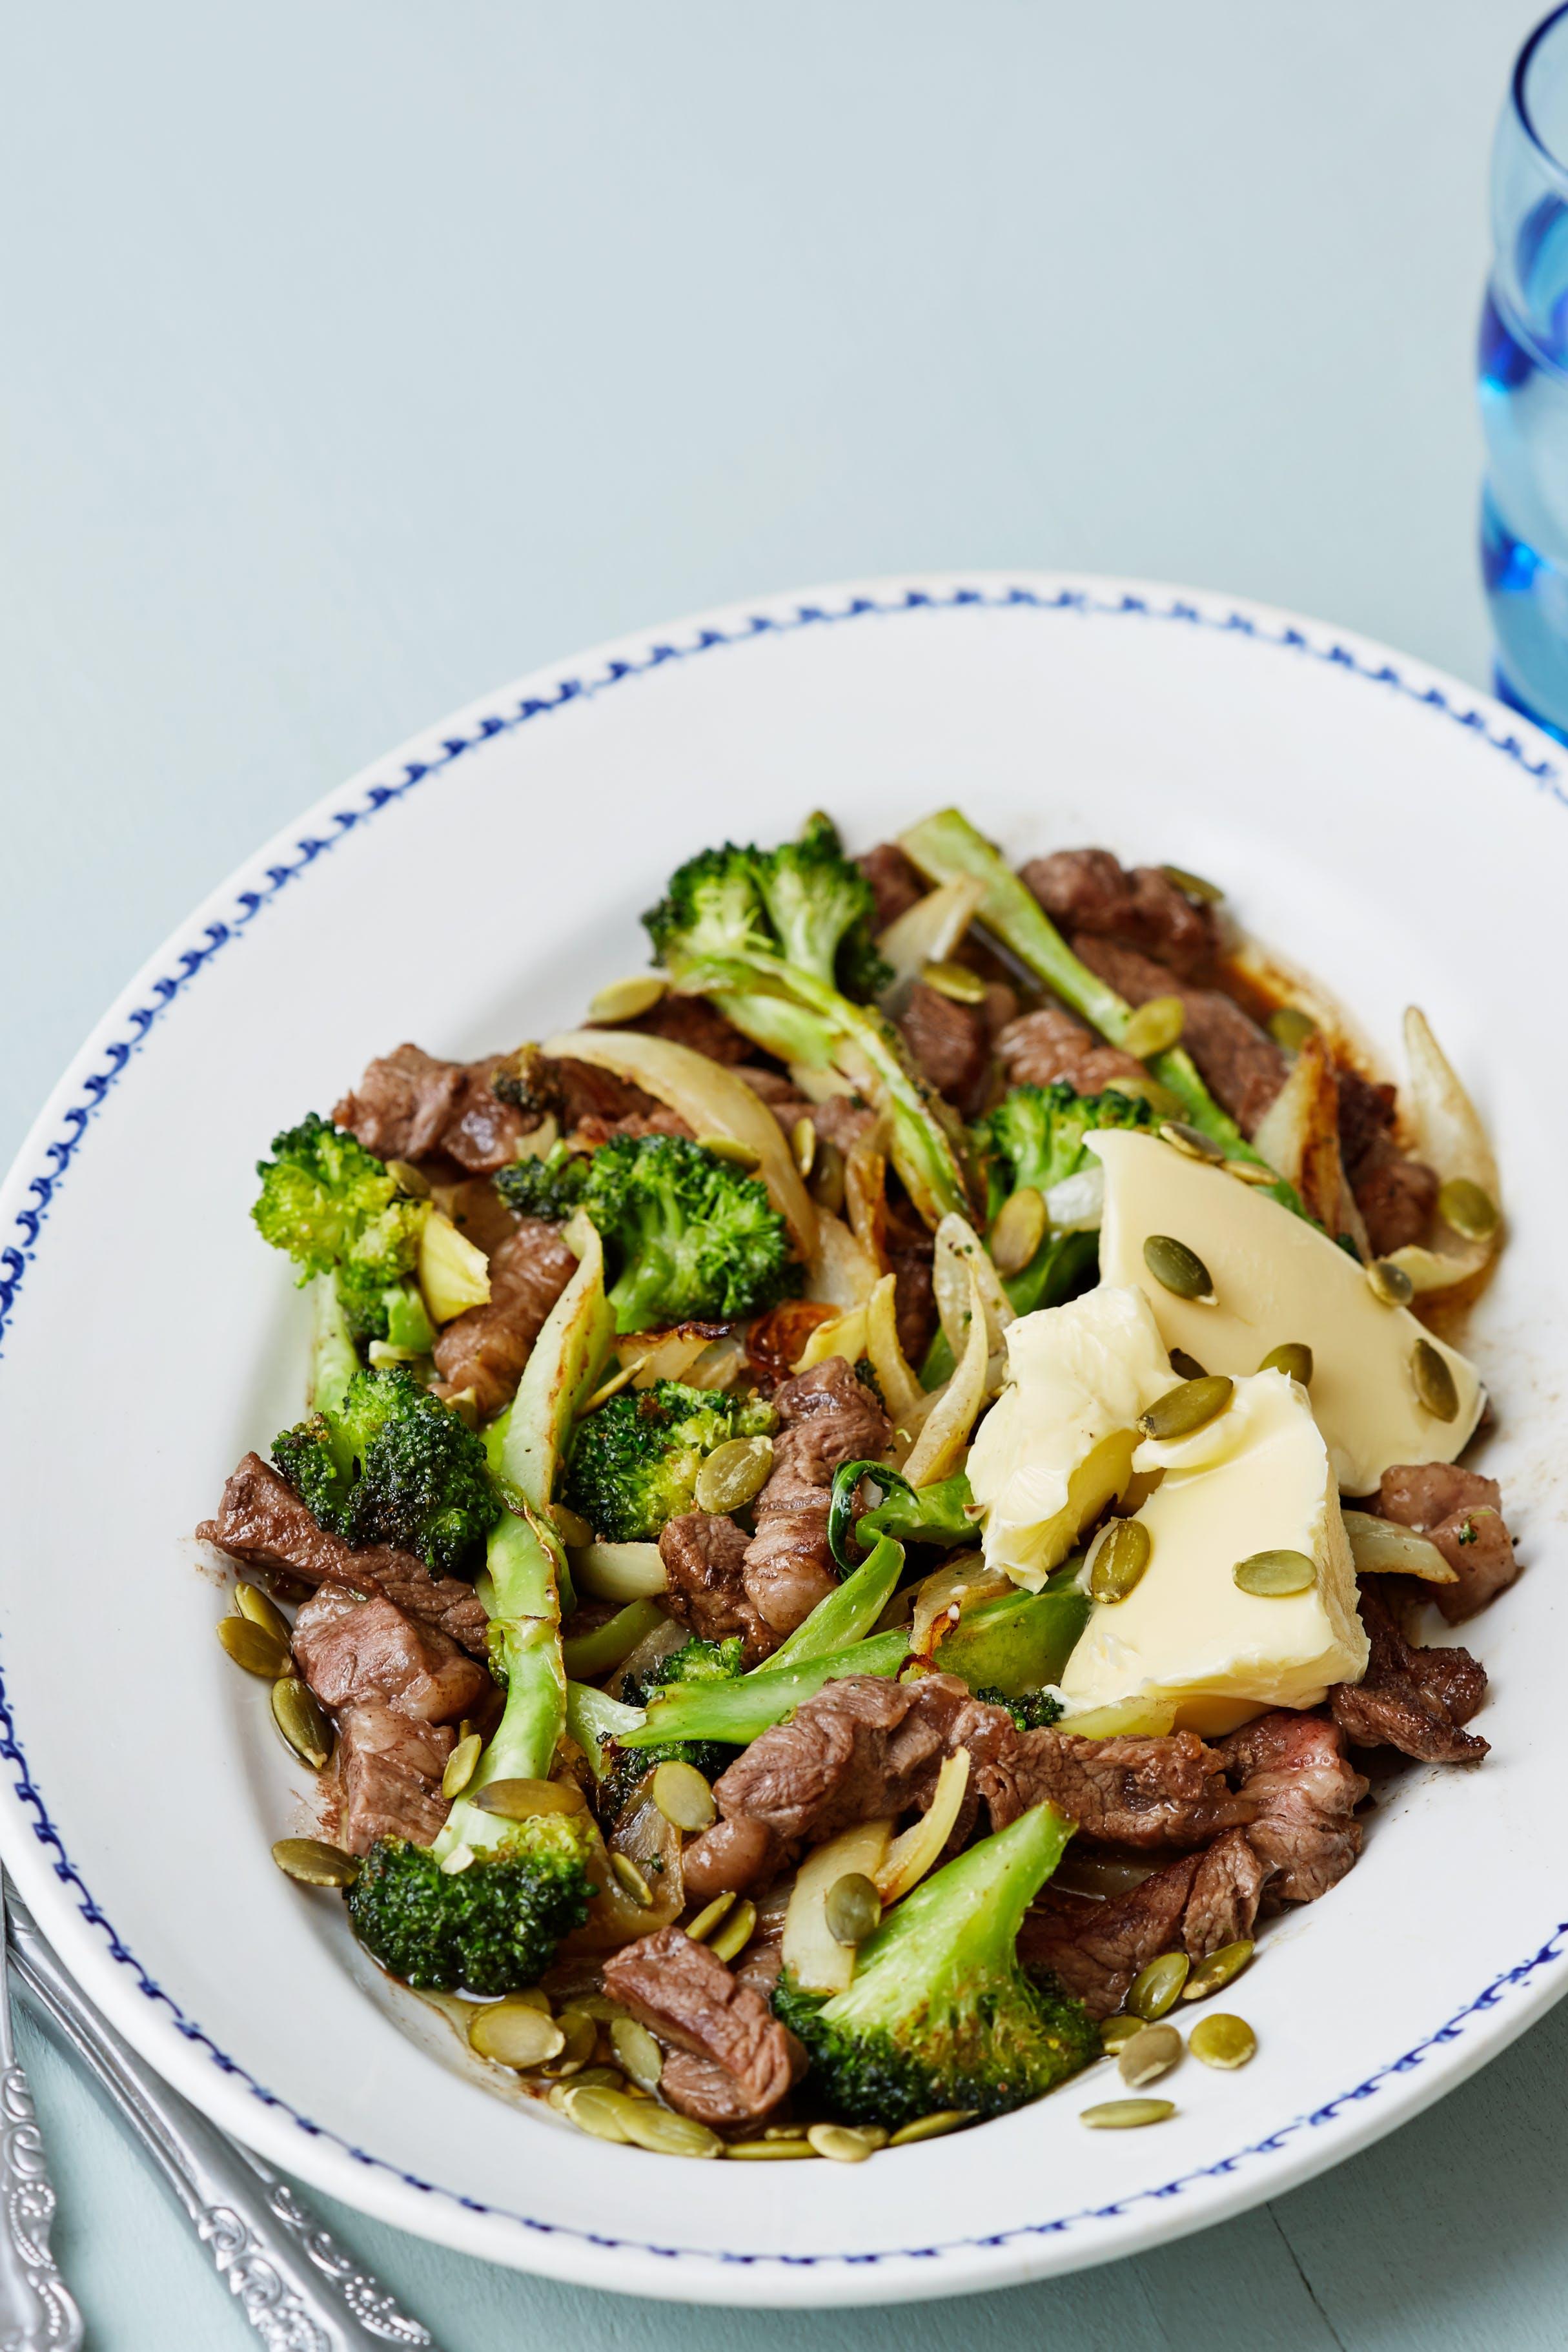 Smörstekt strimlad biff med broccoli